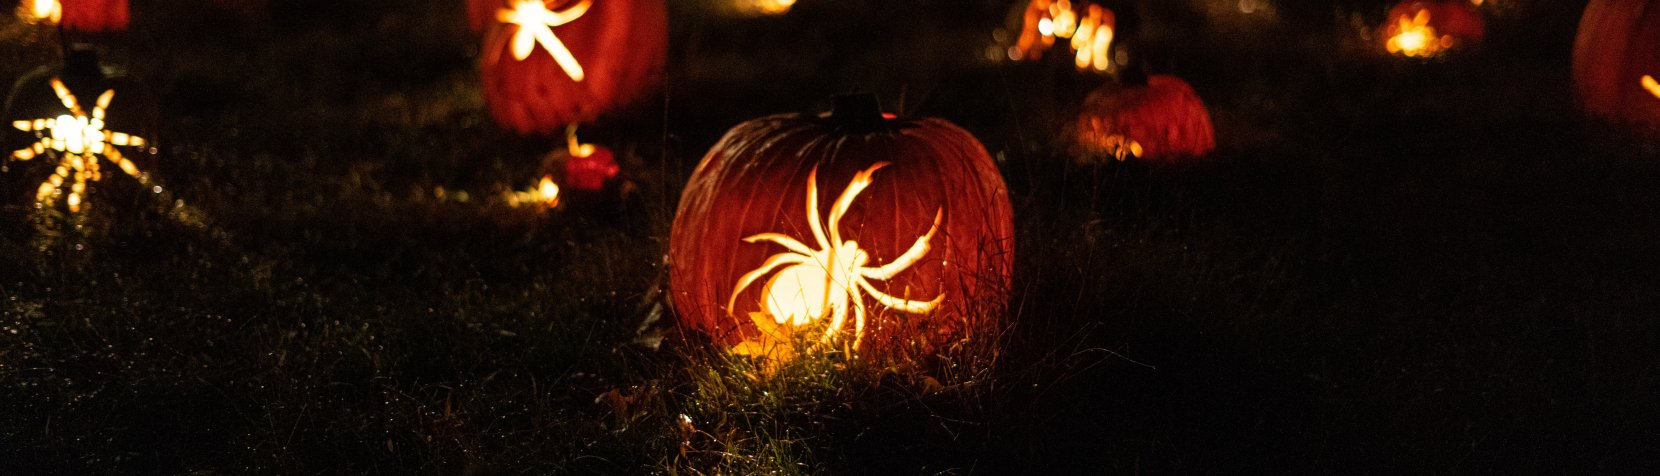 Græskar udskåret med edderkopper